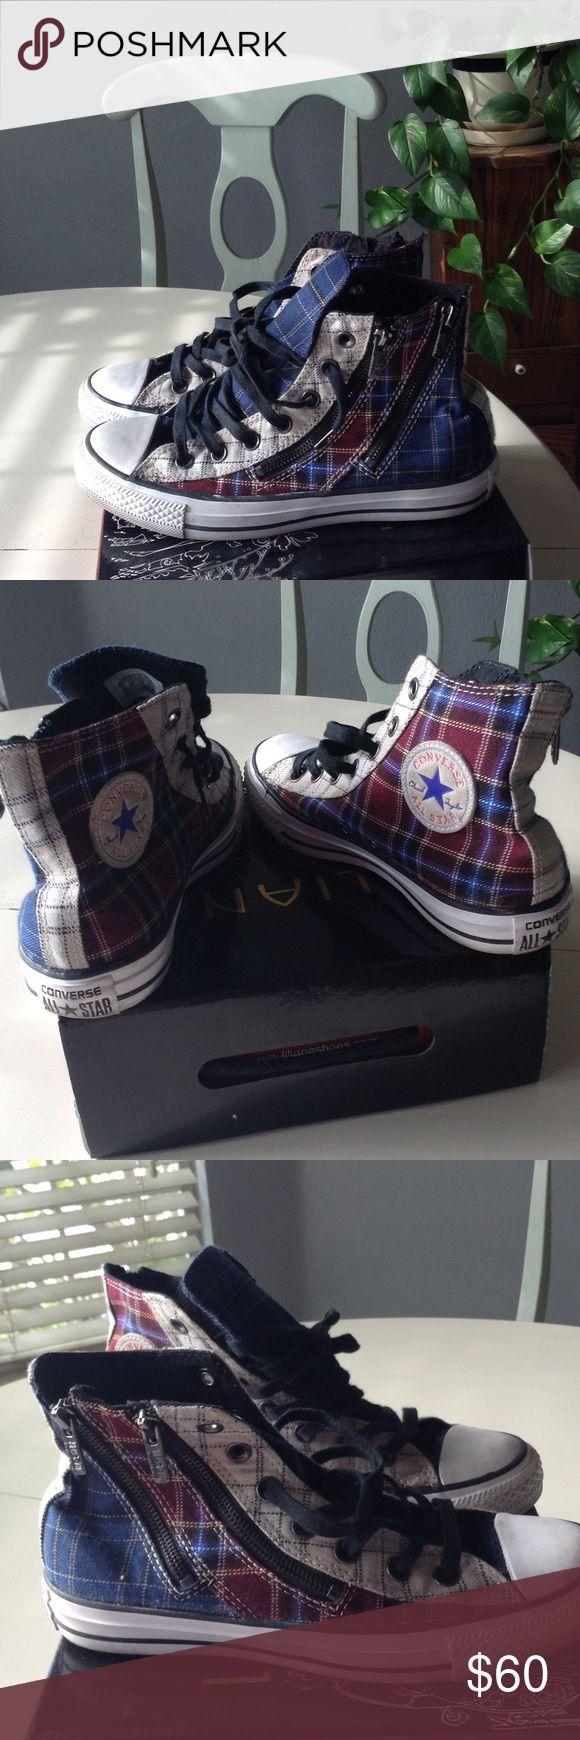 converse zip up shoes. adorable high top, plaid, zip up converse ⭐️nwot⭐️ shoes